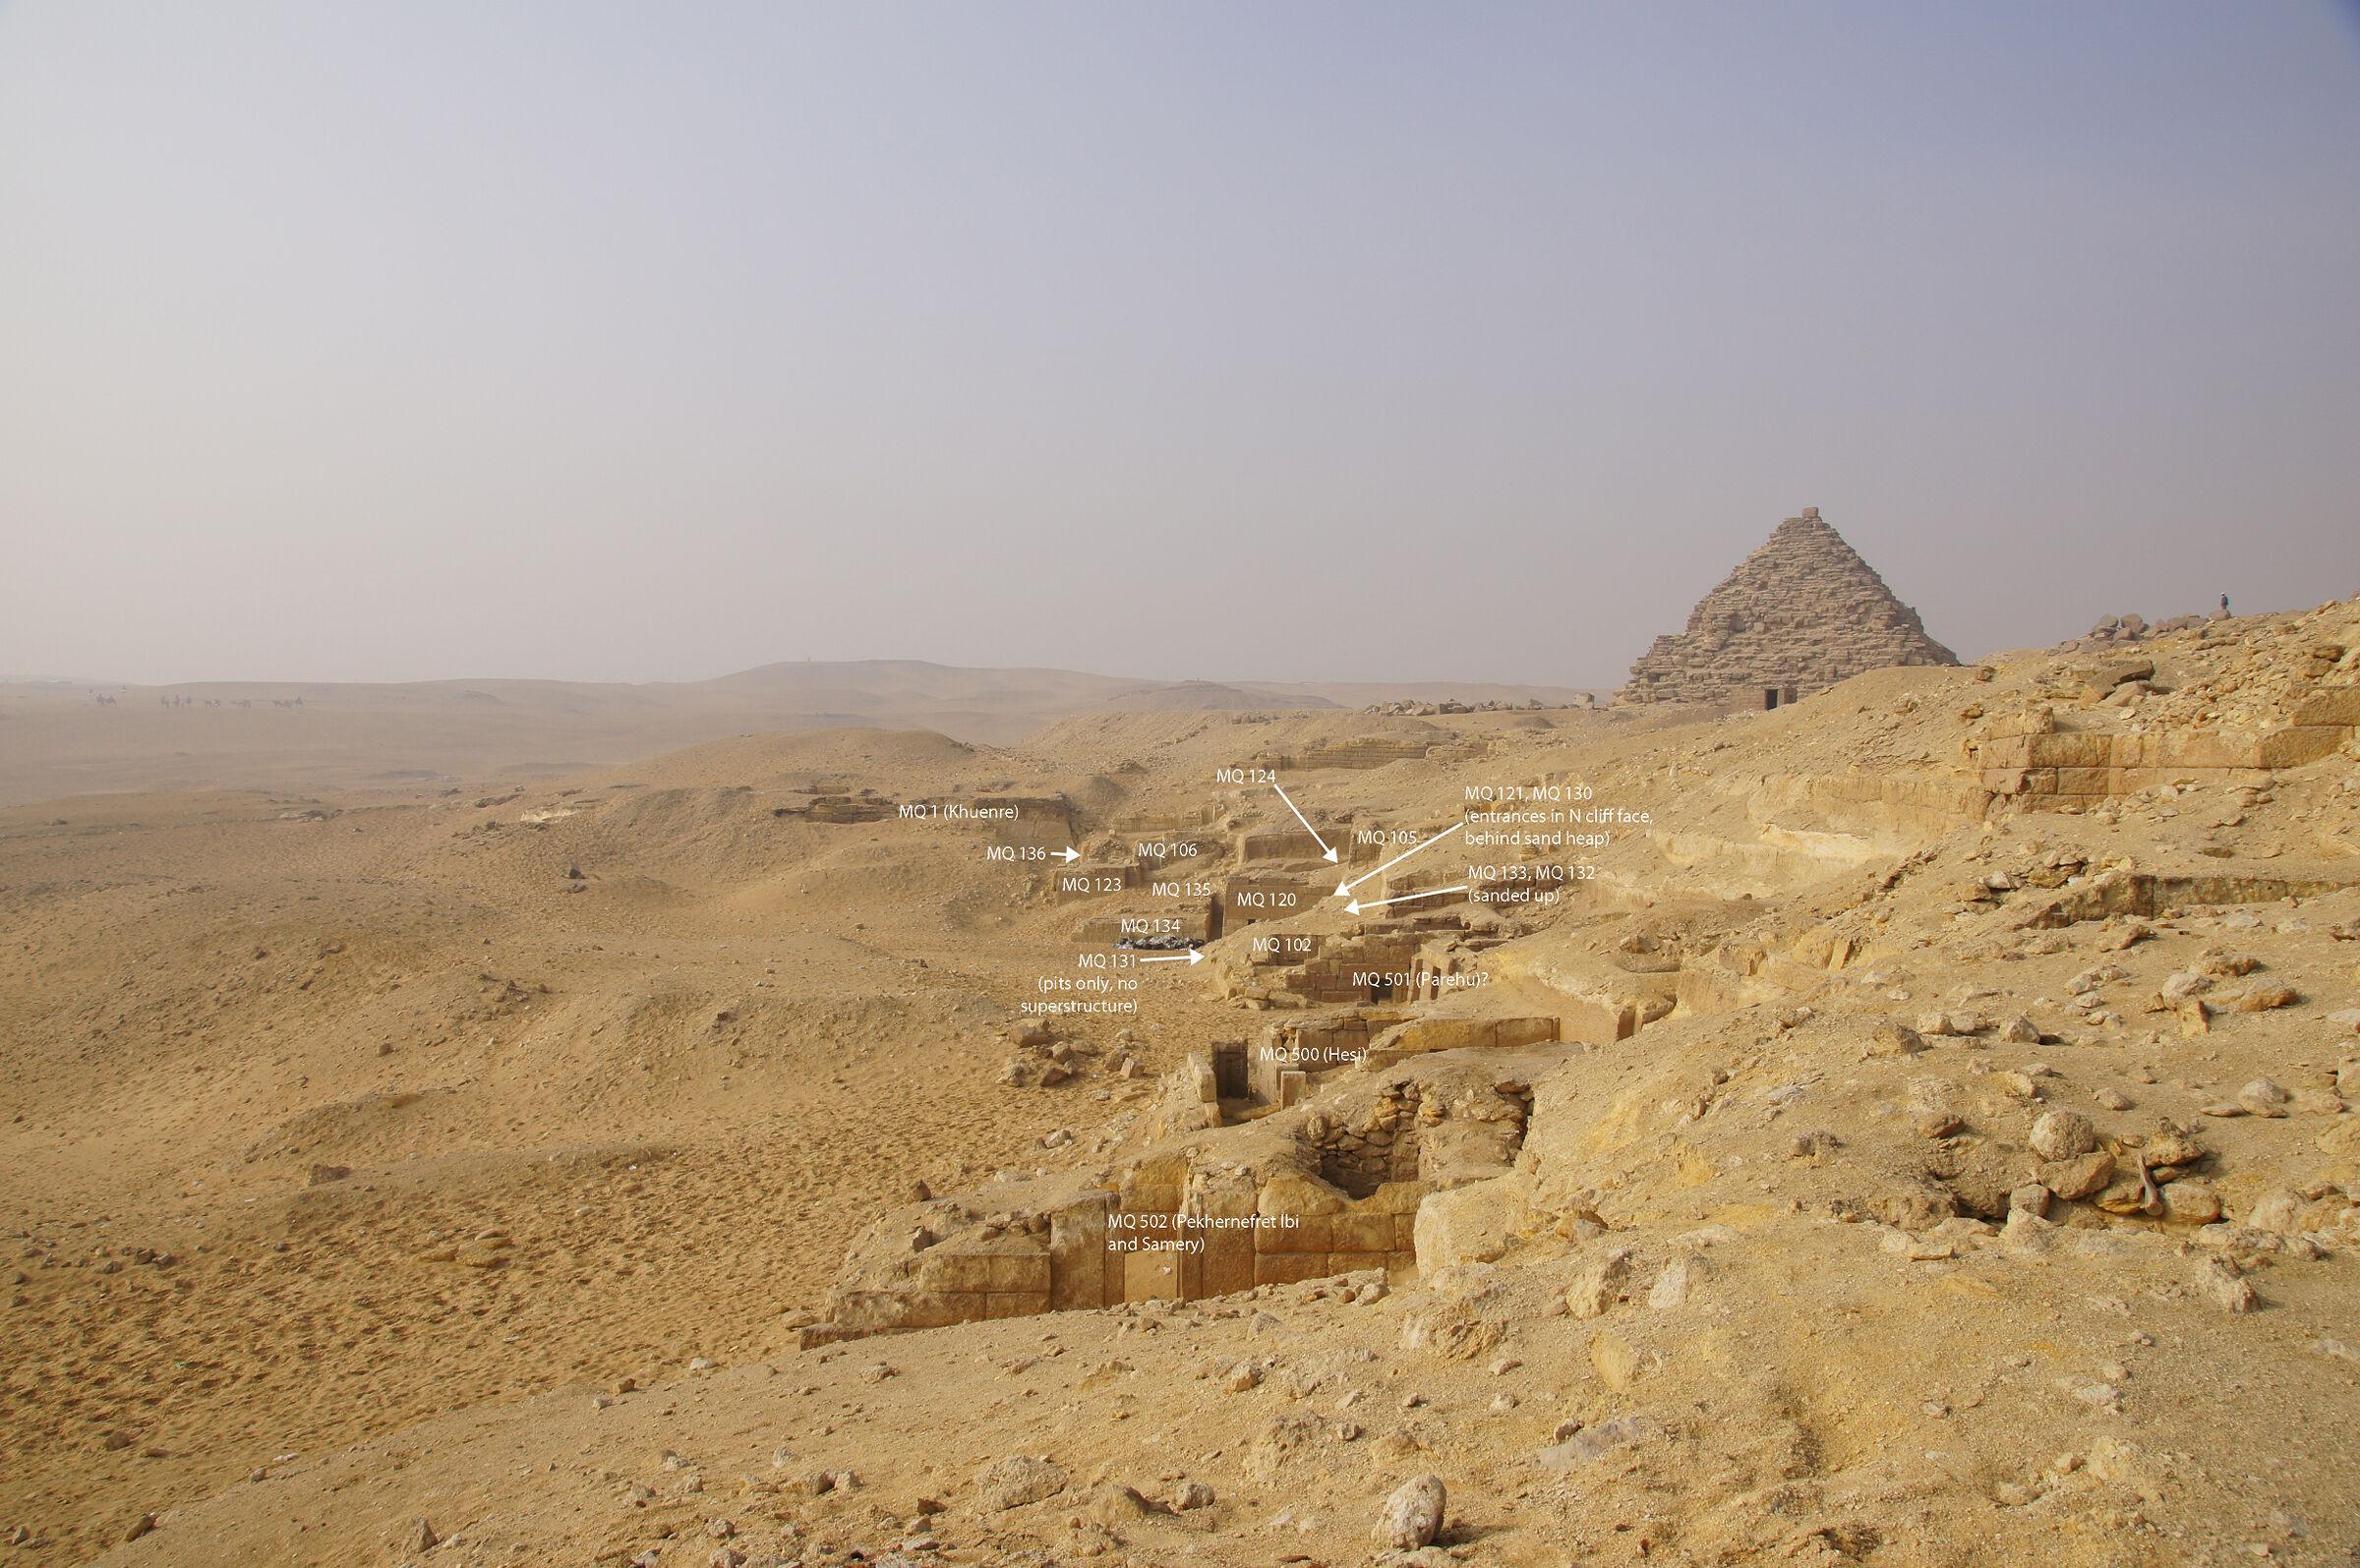 Menkaure Quarry Cemetery: Site: Giza; View: MQ 502, MQ 500, MQ 501(?), MQ 102, MQ 131, MQ 132, MQ 133, MQ 101(?), MQ 130, MQ 121, MQ 120, MQ 134, MQ 135, MQ 105, MQ 124, MQ 123, MQ 106, MQ 136, MQ 1, G III-a